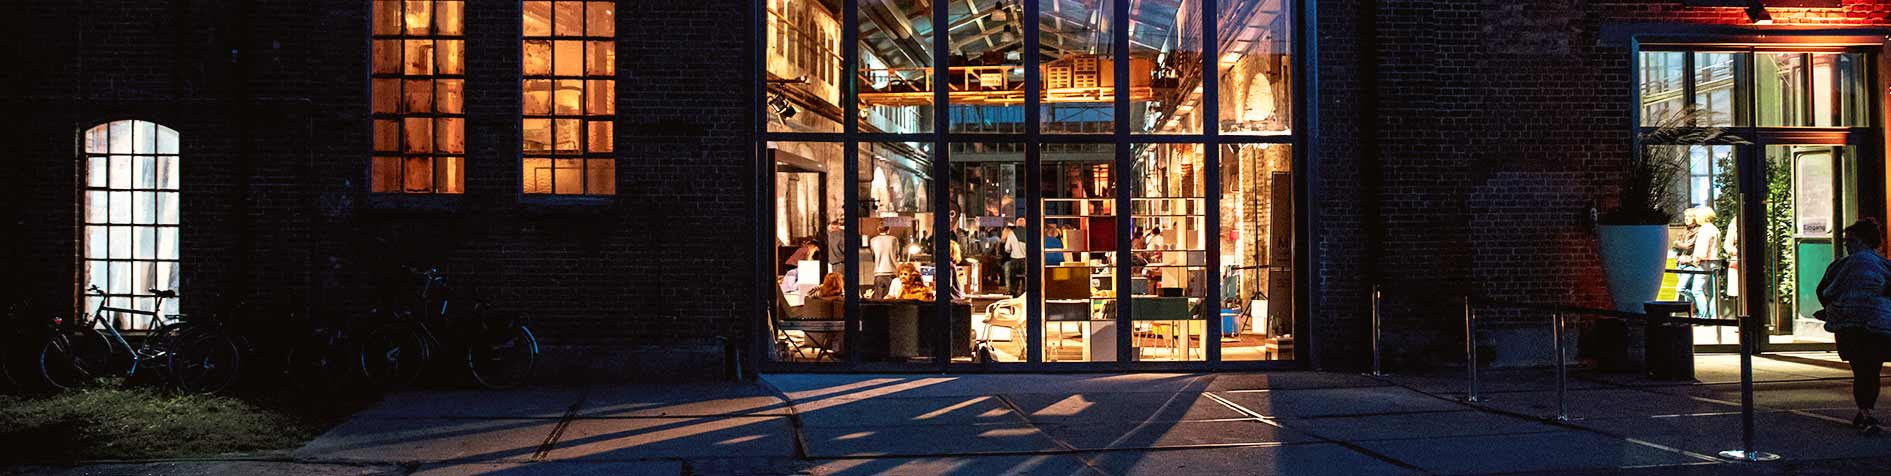 Designtage Lübeck